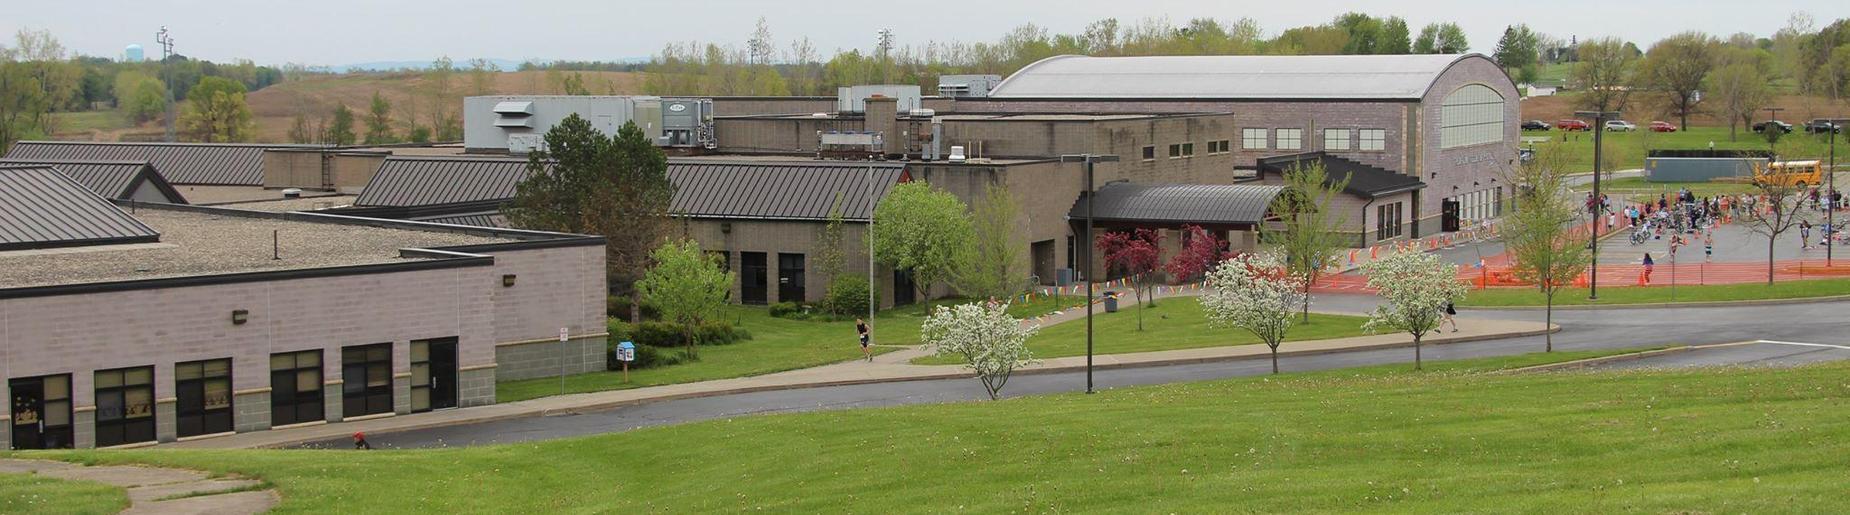 Richard Mann Elementary School